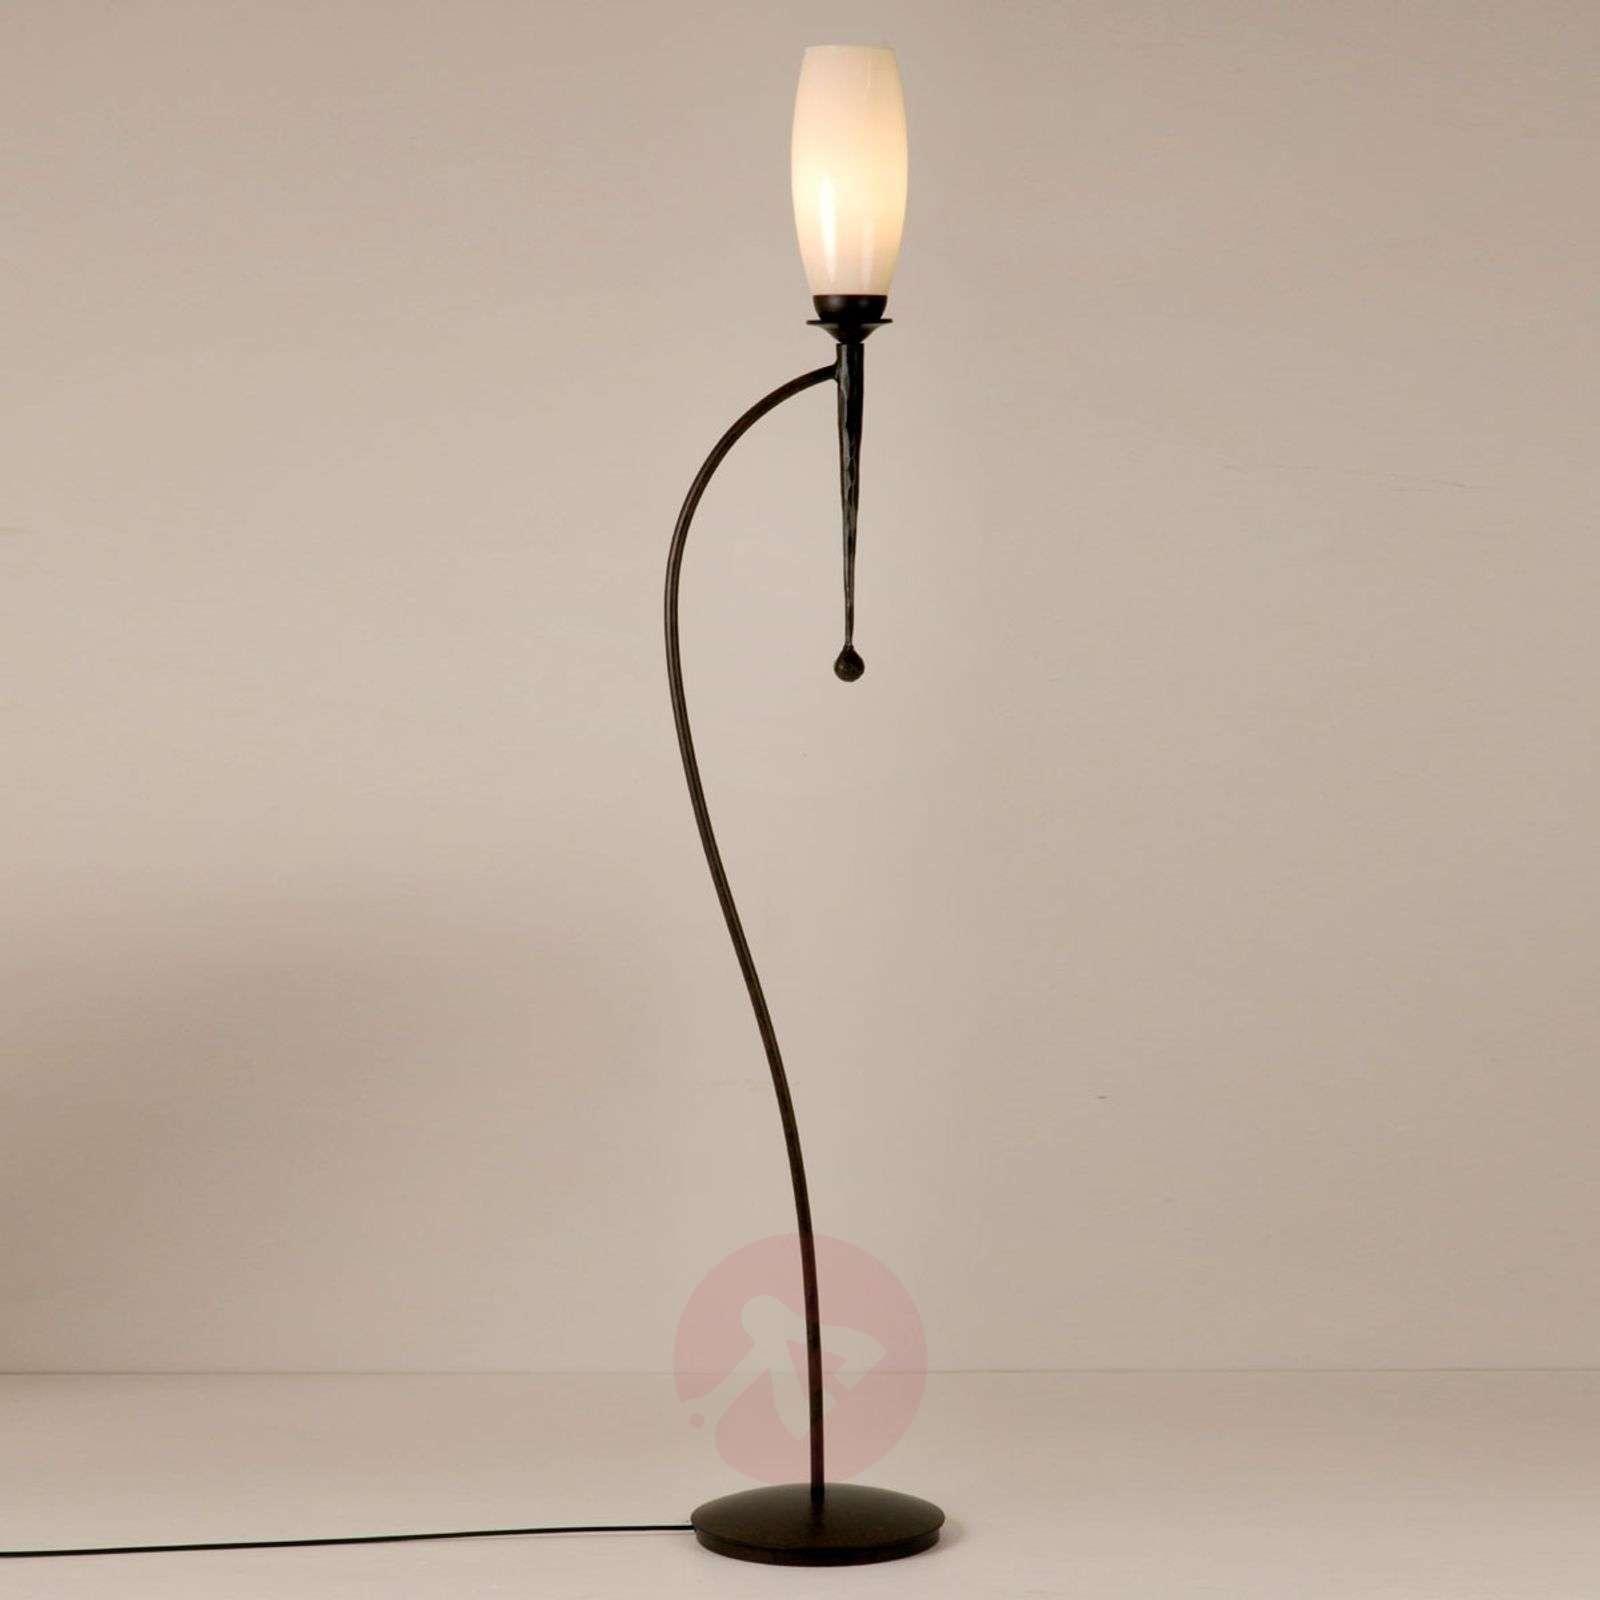 Interesting CHATEAU floor lamp-6528080-01